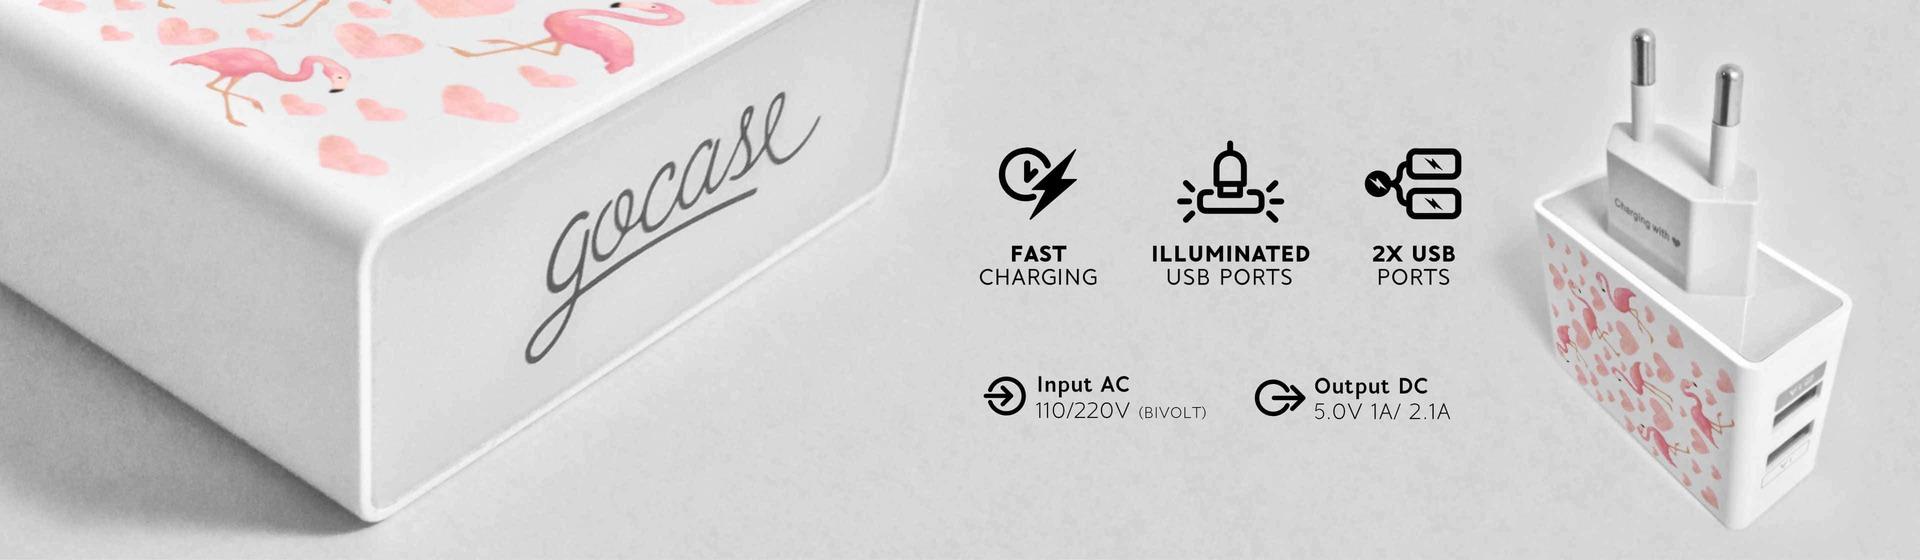 Fast Charging, Iluminated USB Ports, 2x USB Ports